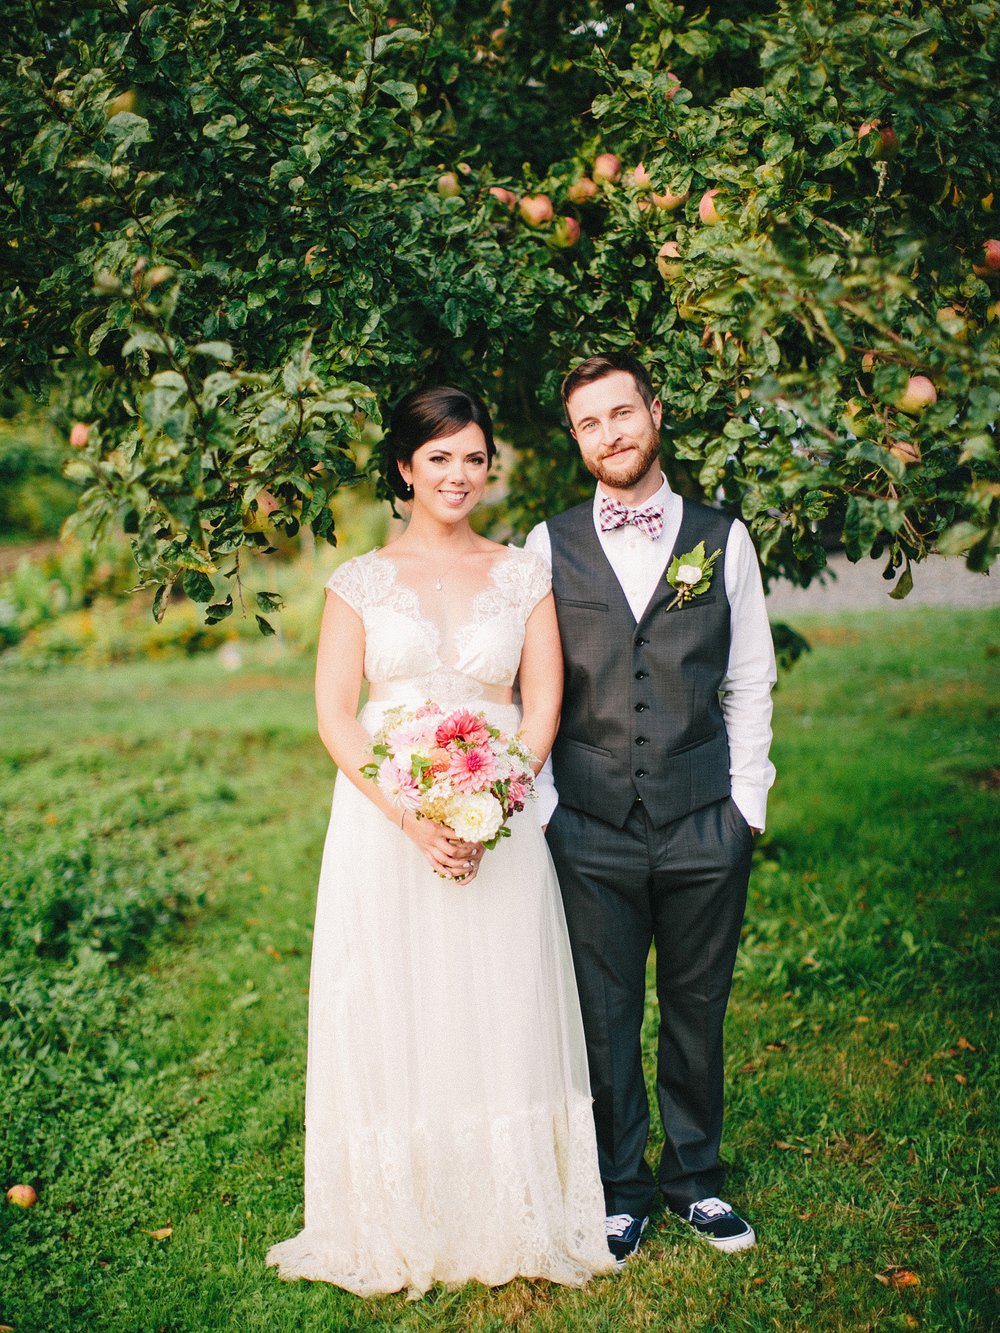 jmblog-farm-kitchen-wedding-seattle-film-ryan-flynn-0046.JPG